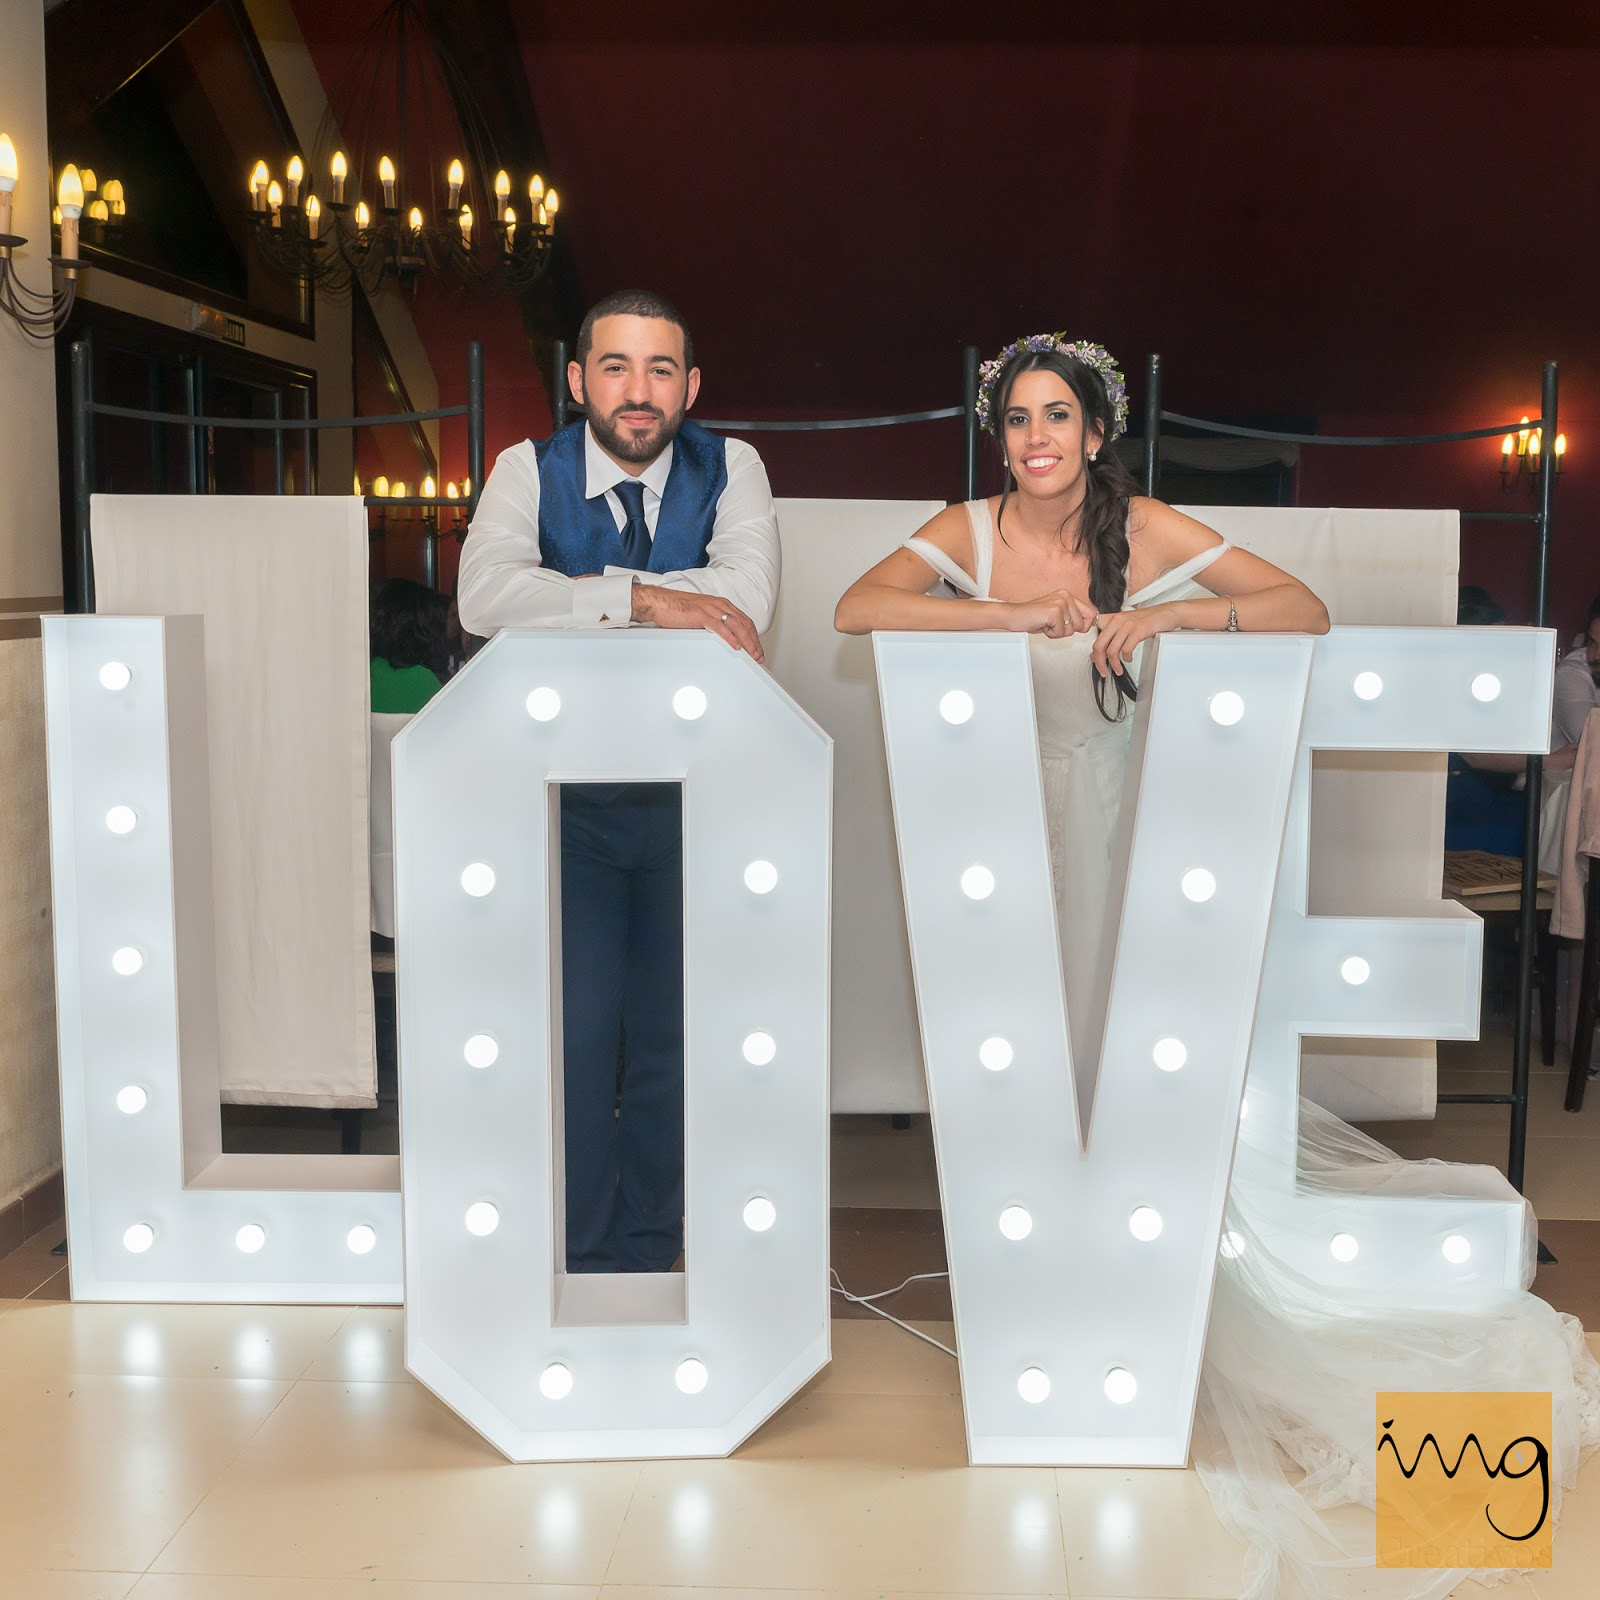 Fotografía de boda con letras LOVE iluminadas